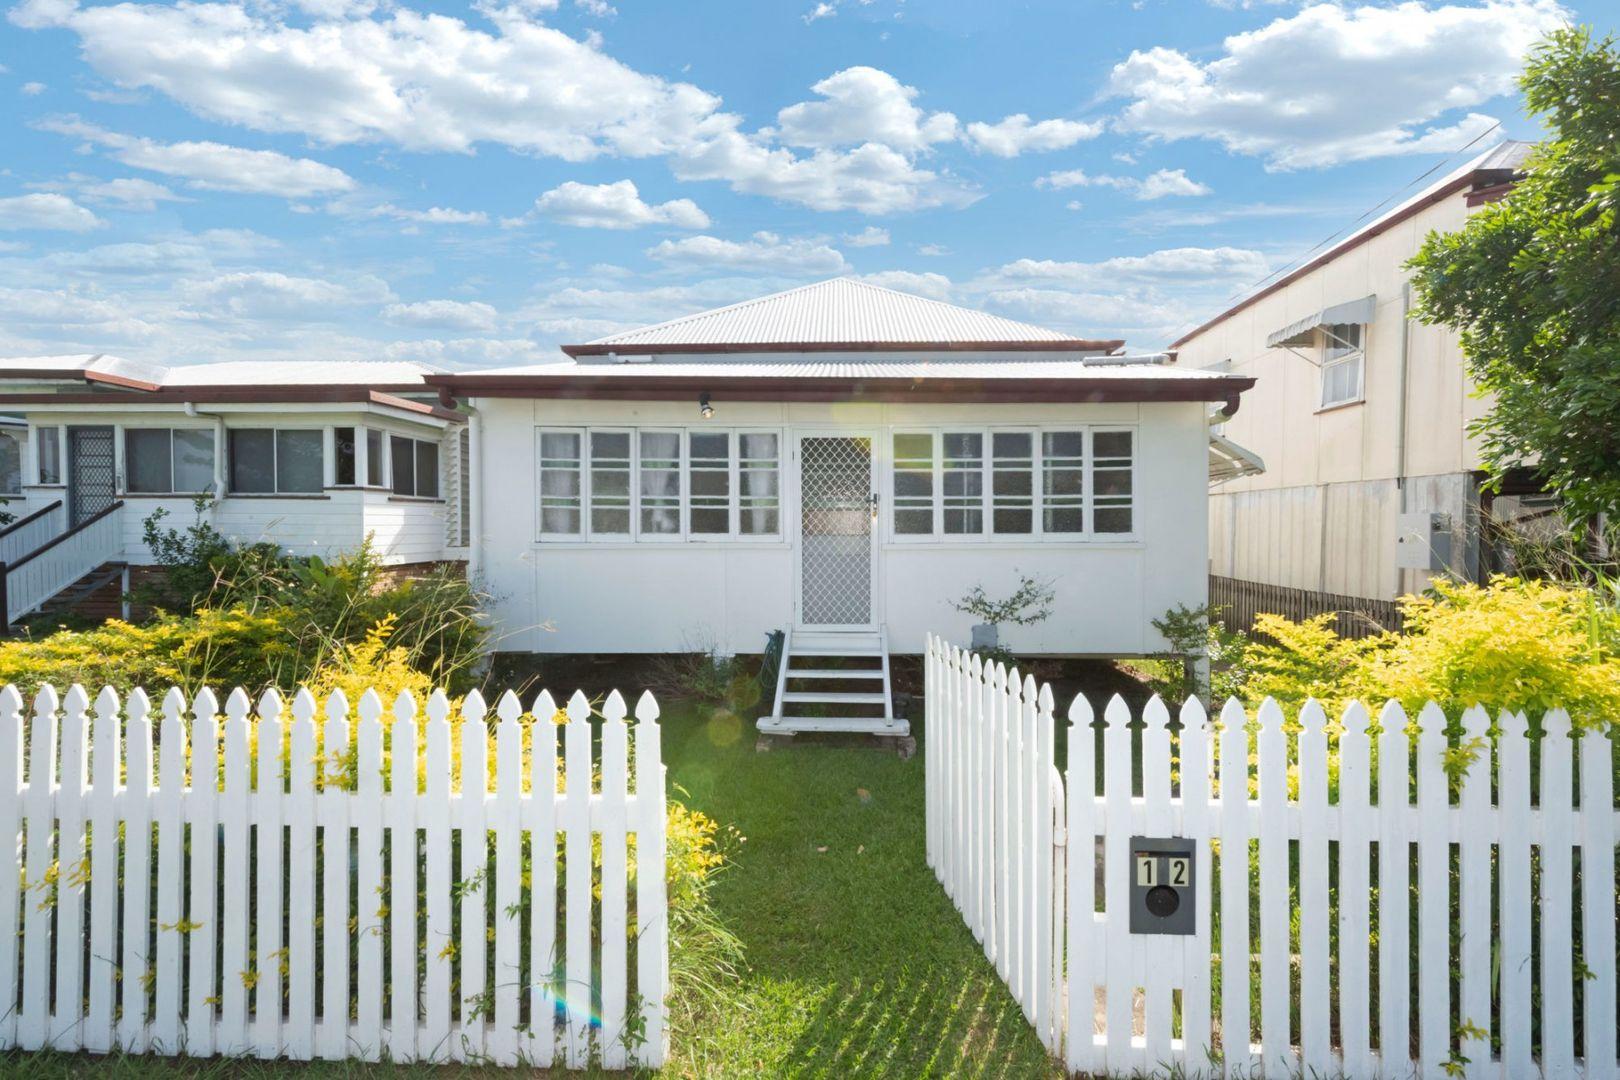 12 Keats Street, Mackay QLD 4740, Image 0